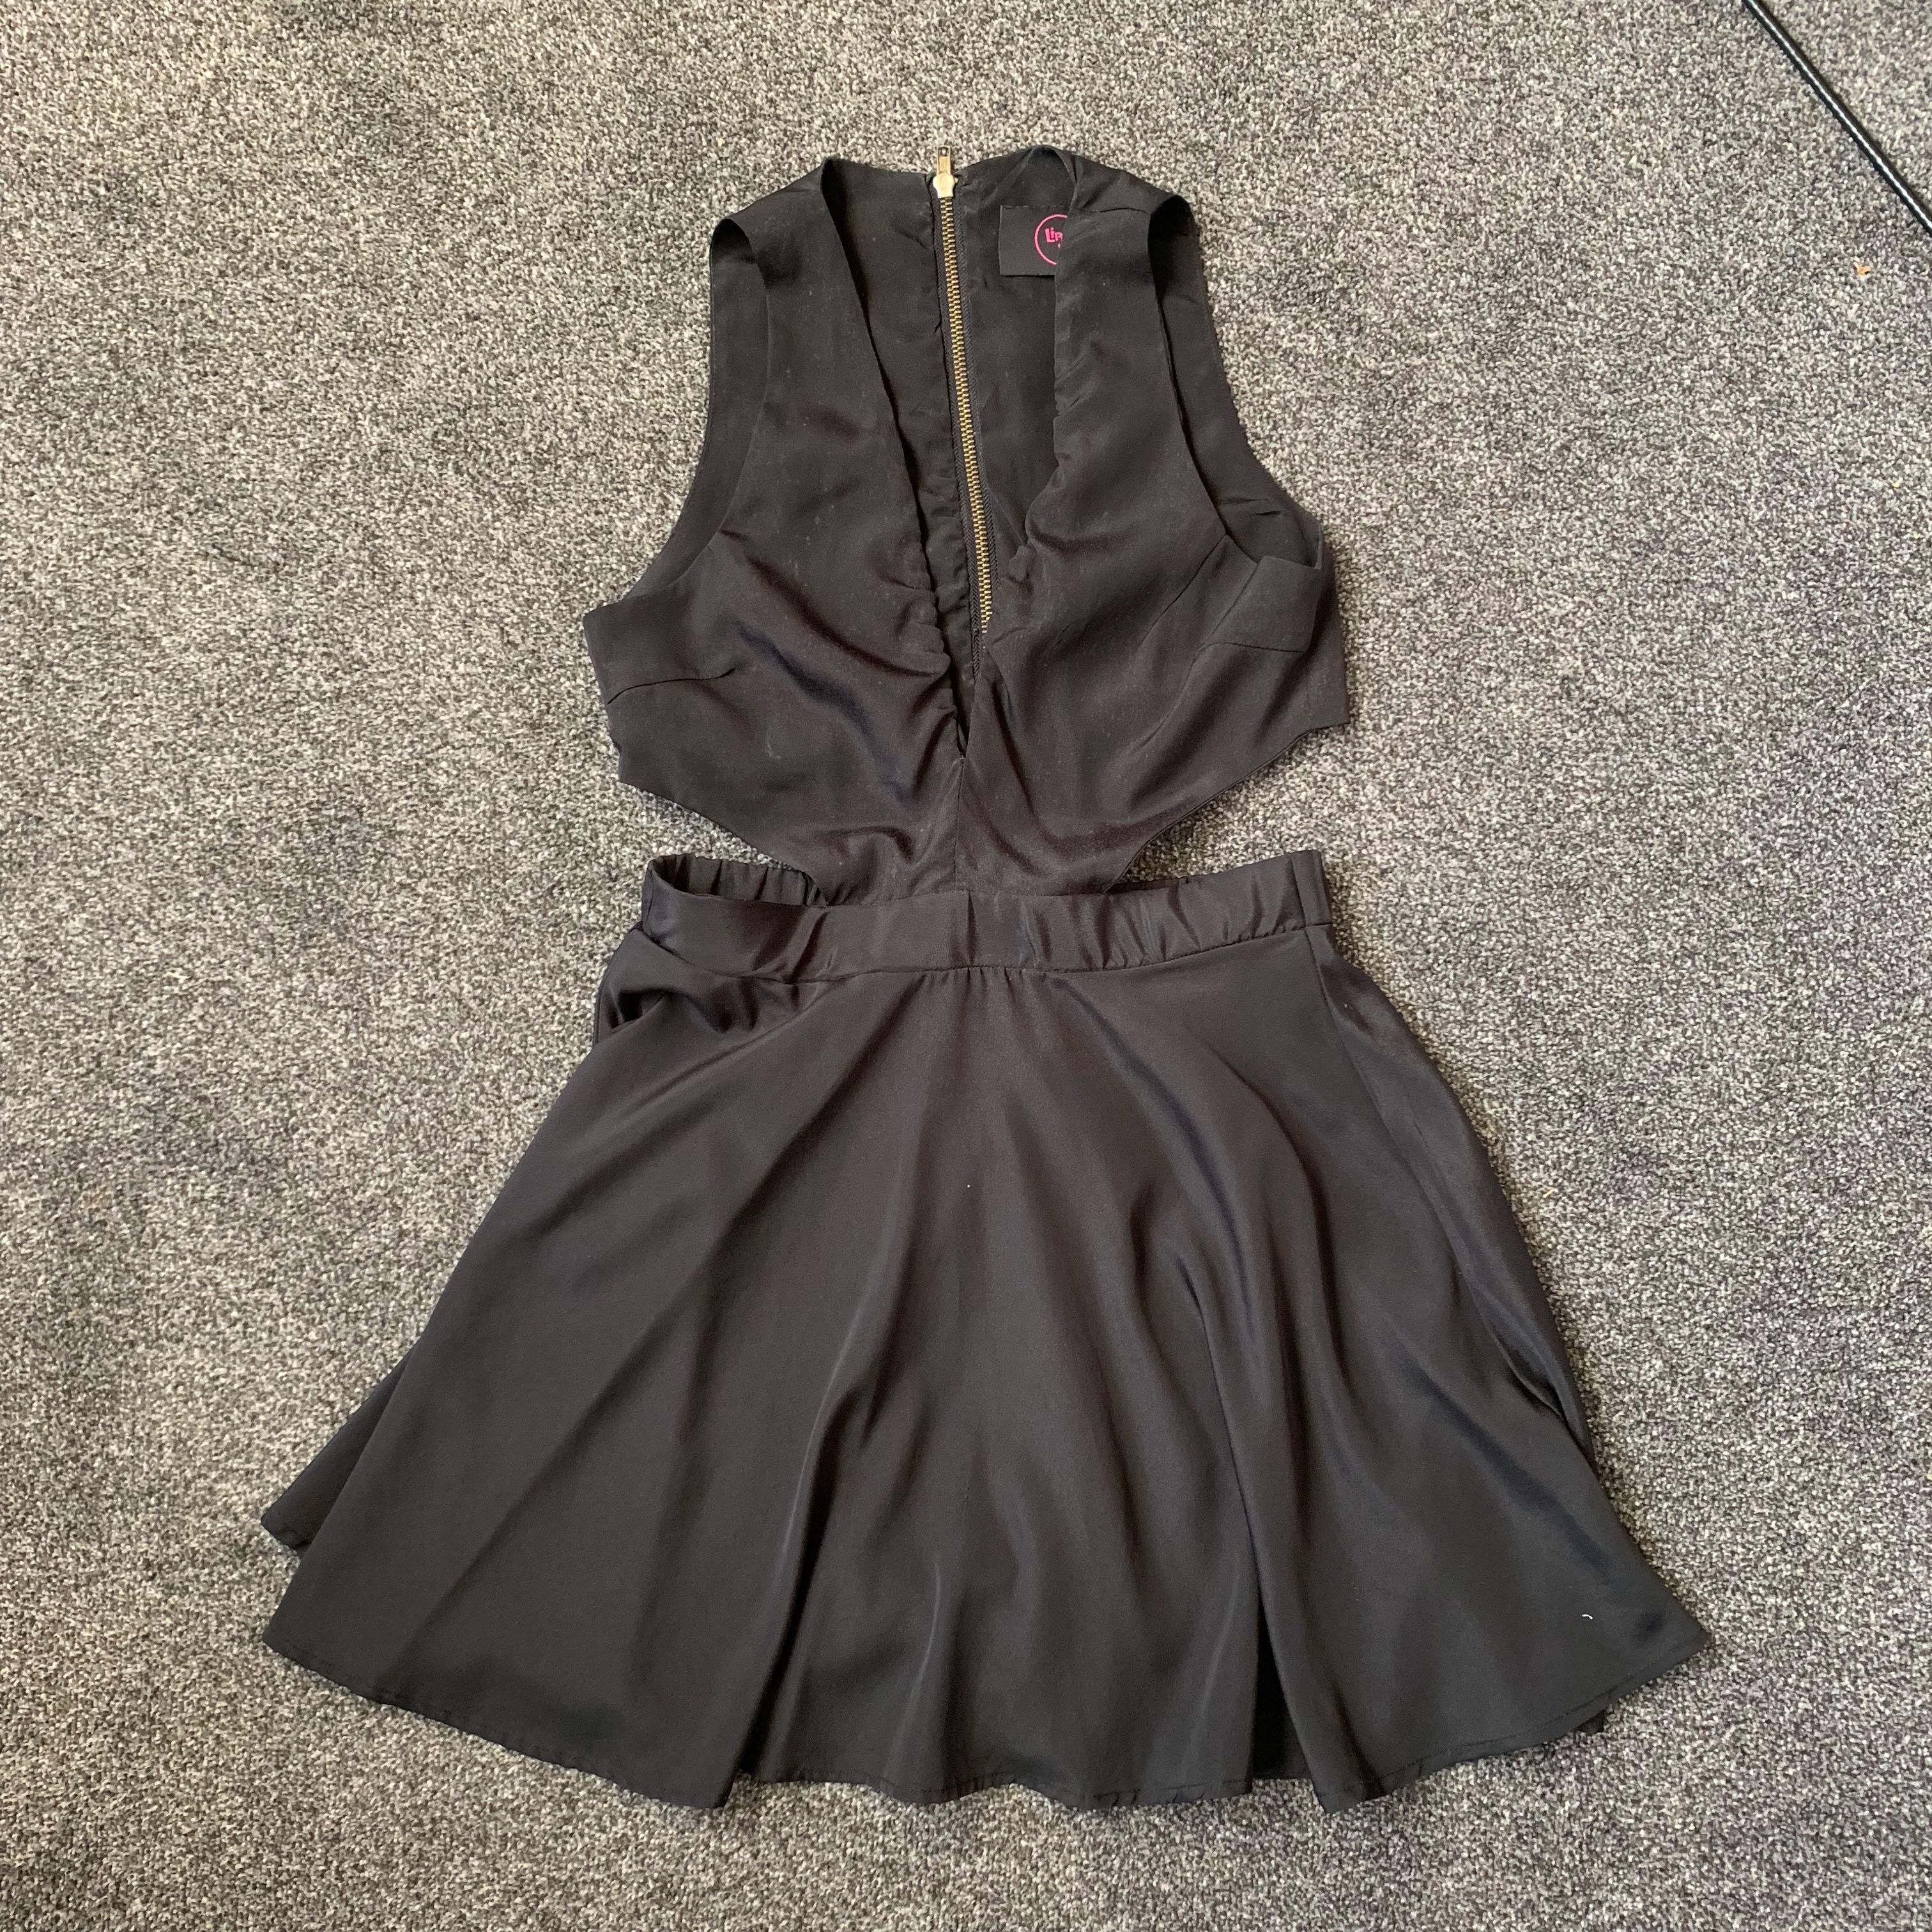 Size 8 Lippy Dress